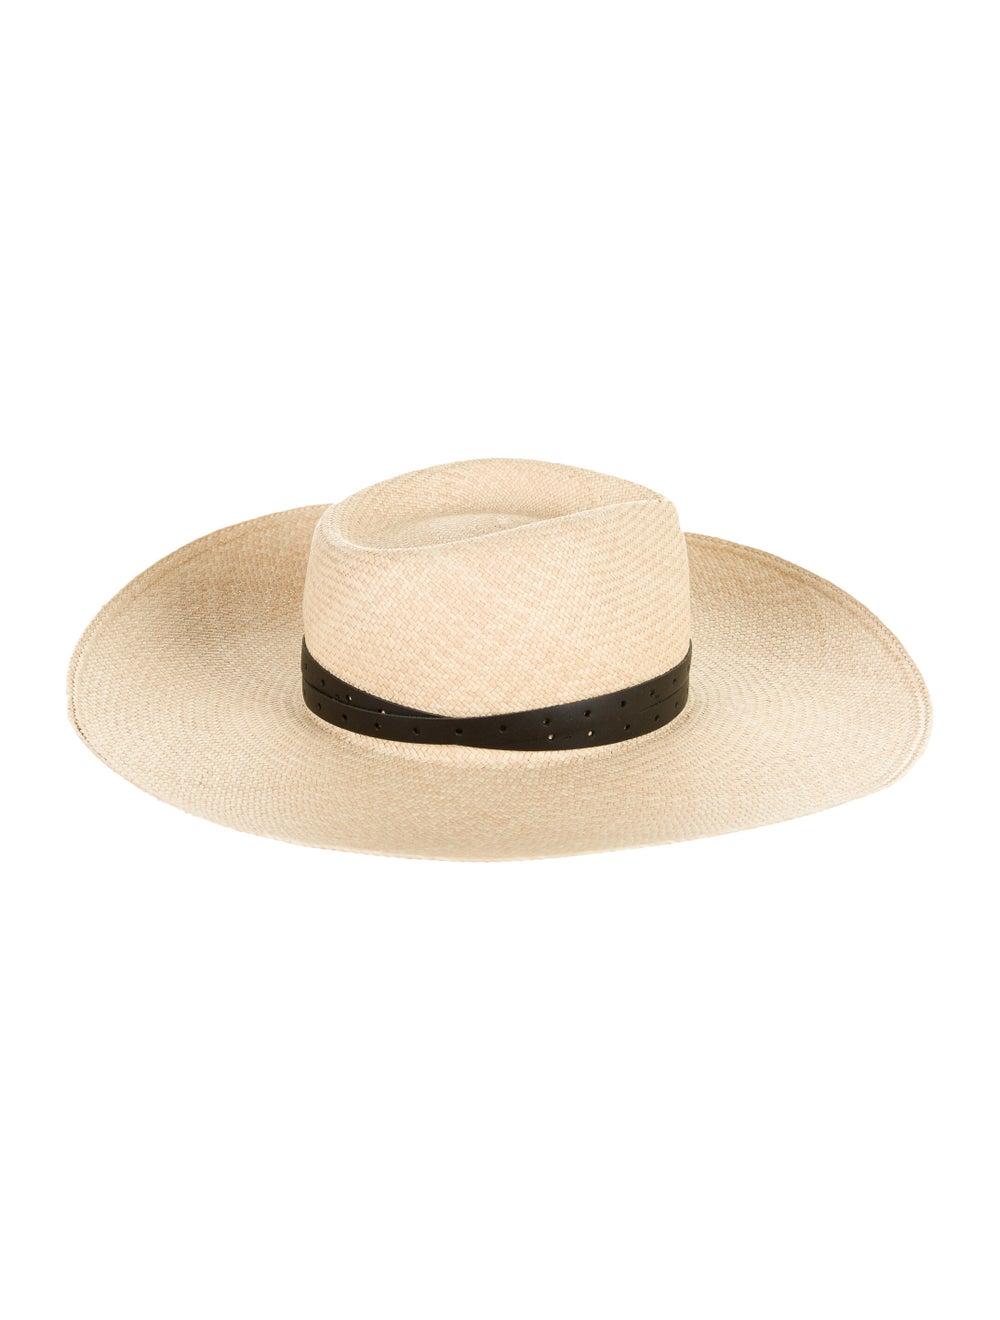 Rag & Bone Wide Brim Straw Hat Tan - image 2